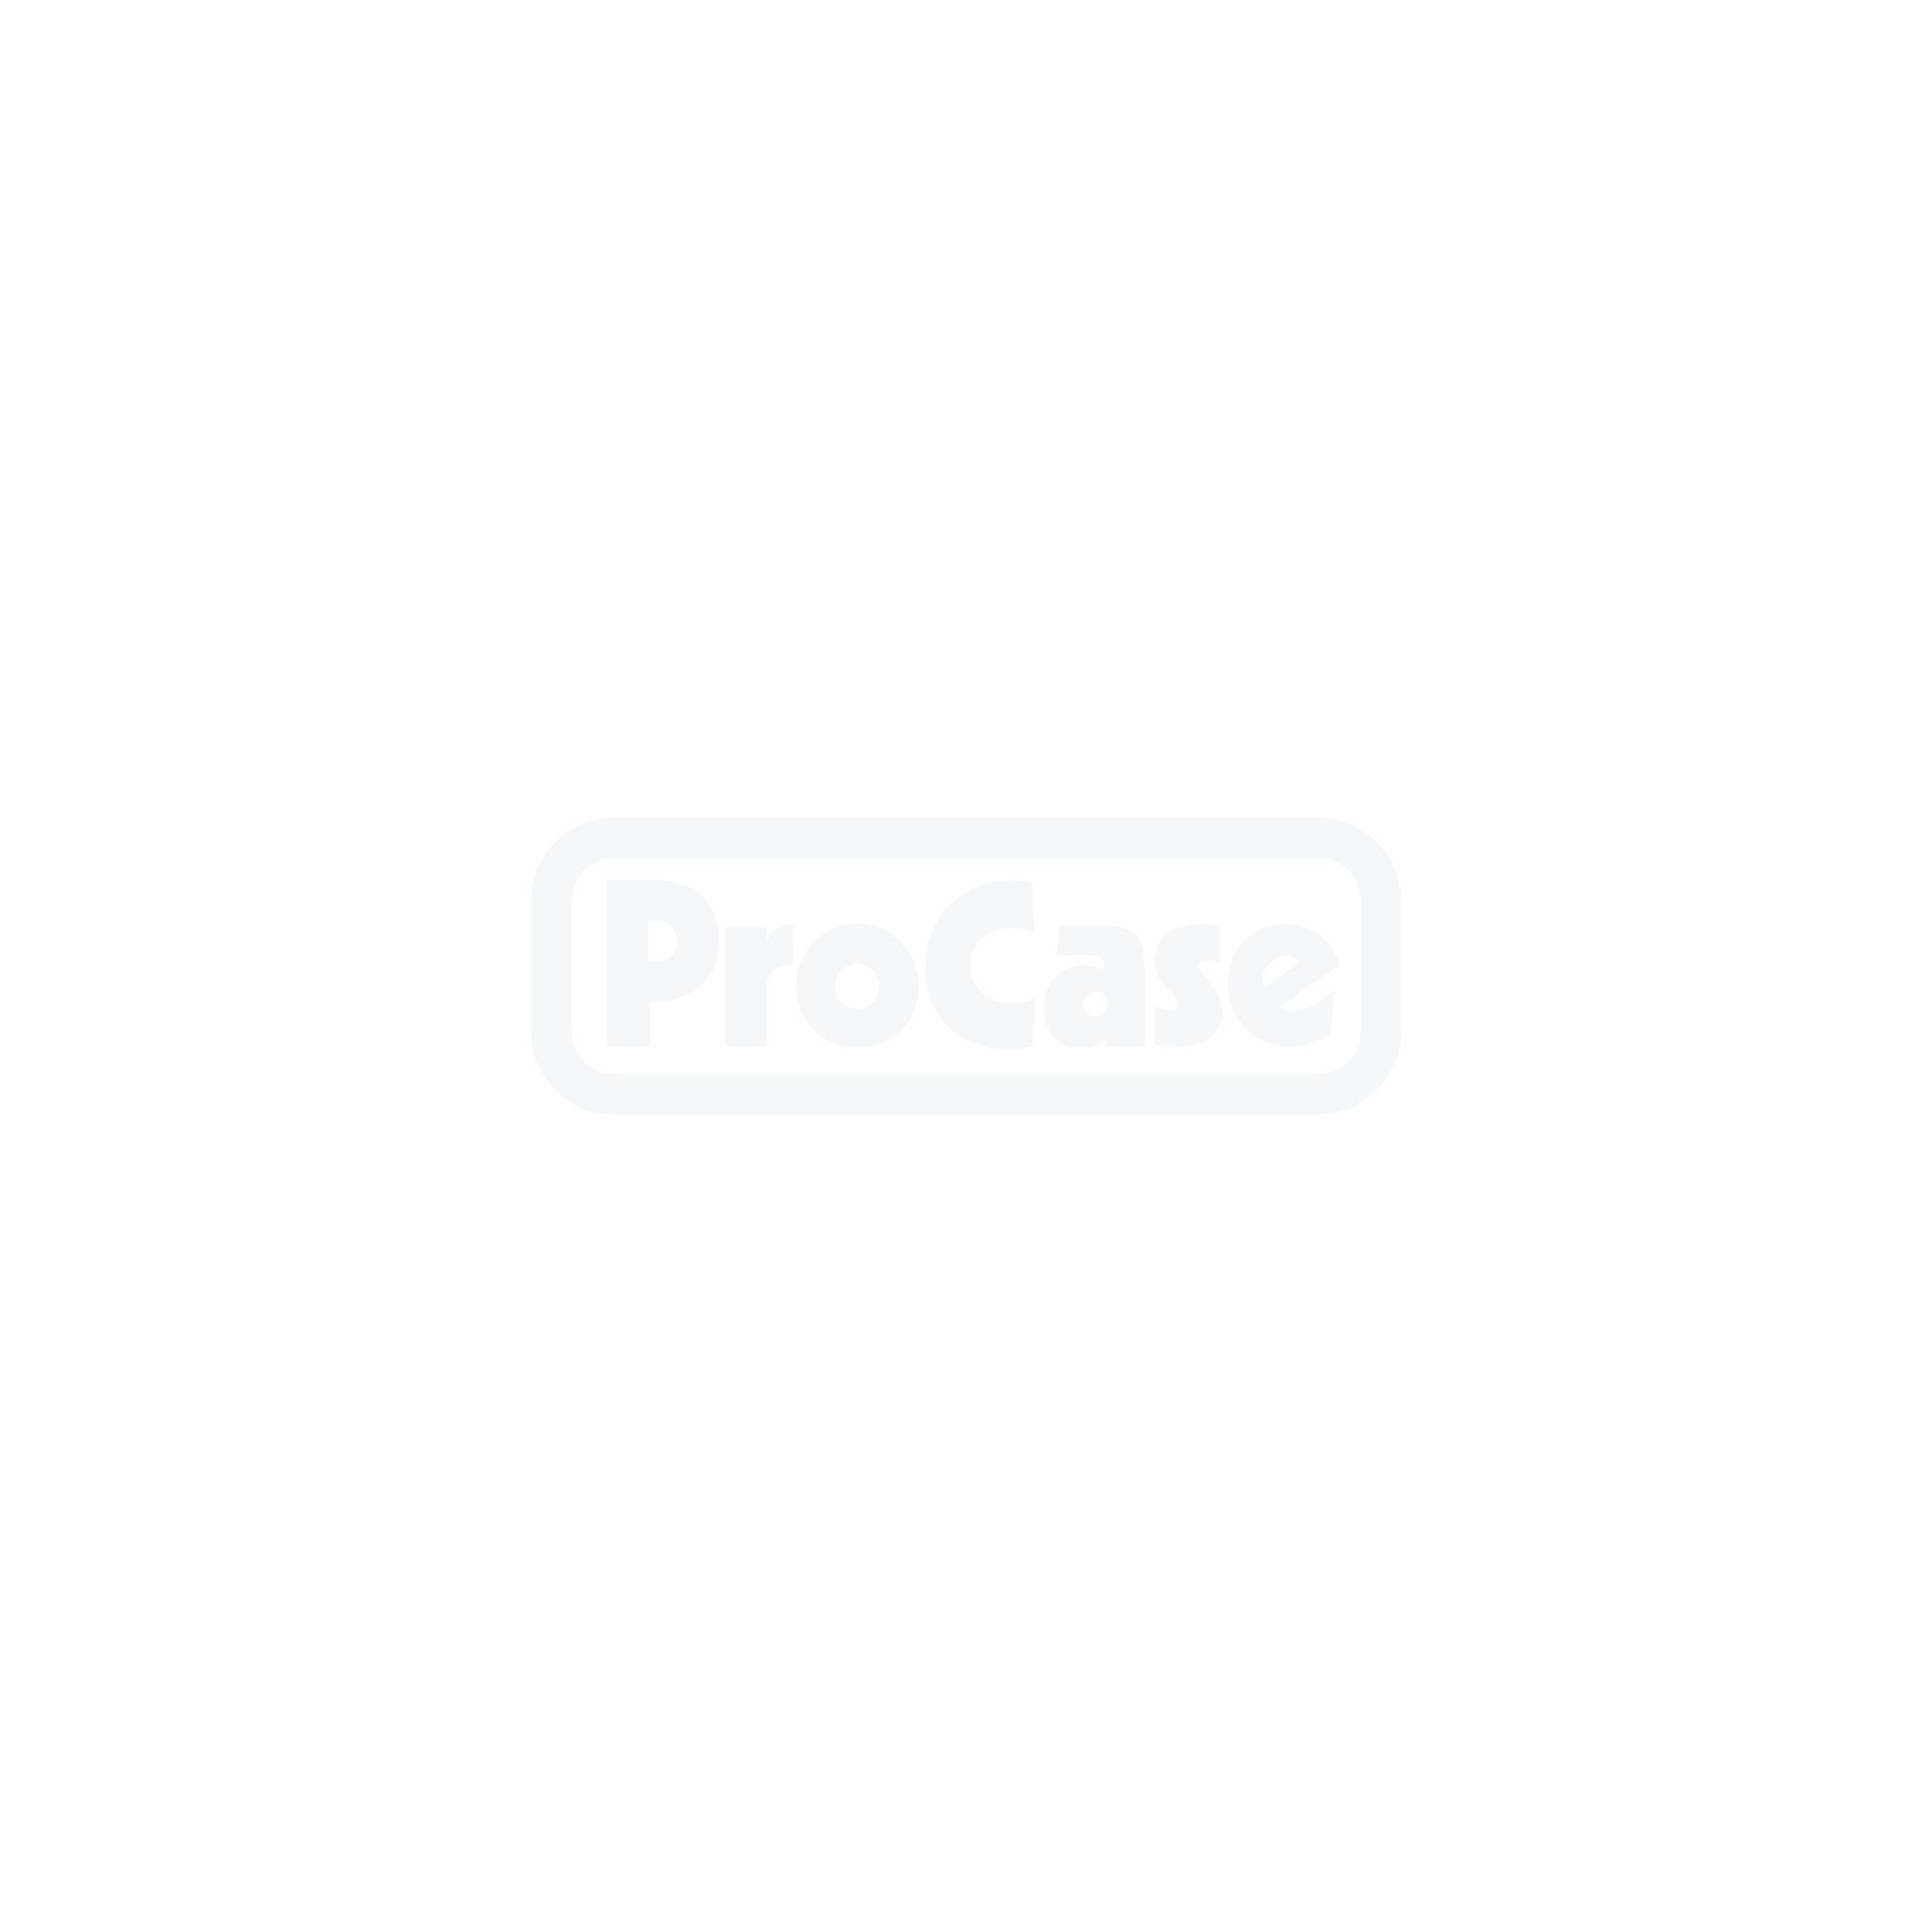 SKB 3R Koffer 2222-20B leer